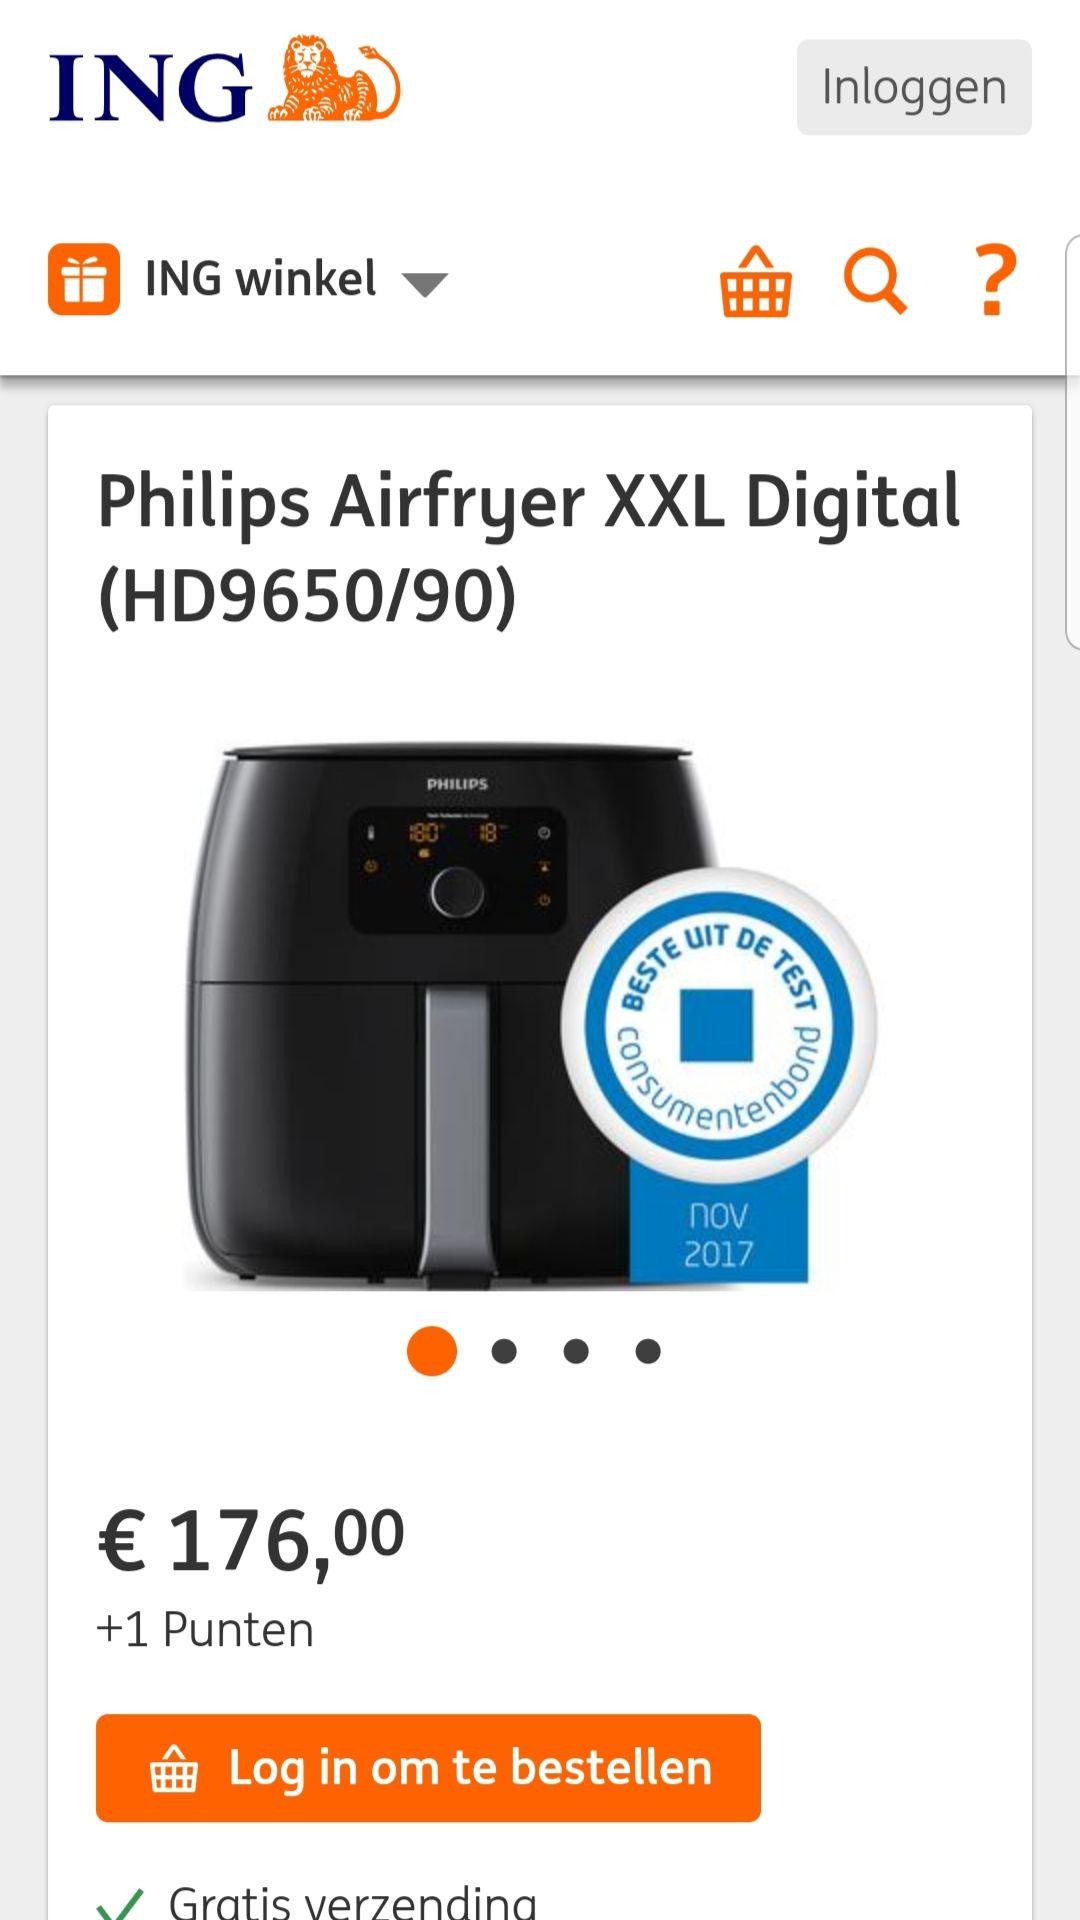 Philips airfryer XXL ING Rentepuntenshop